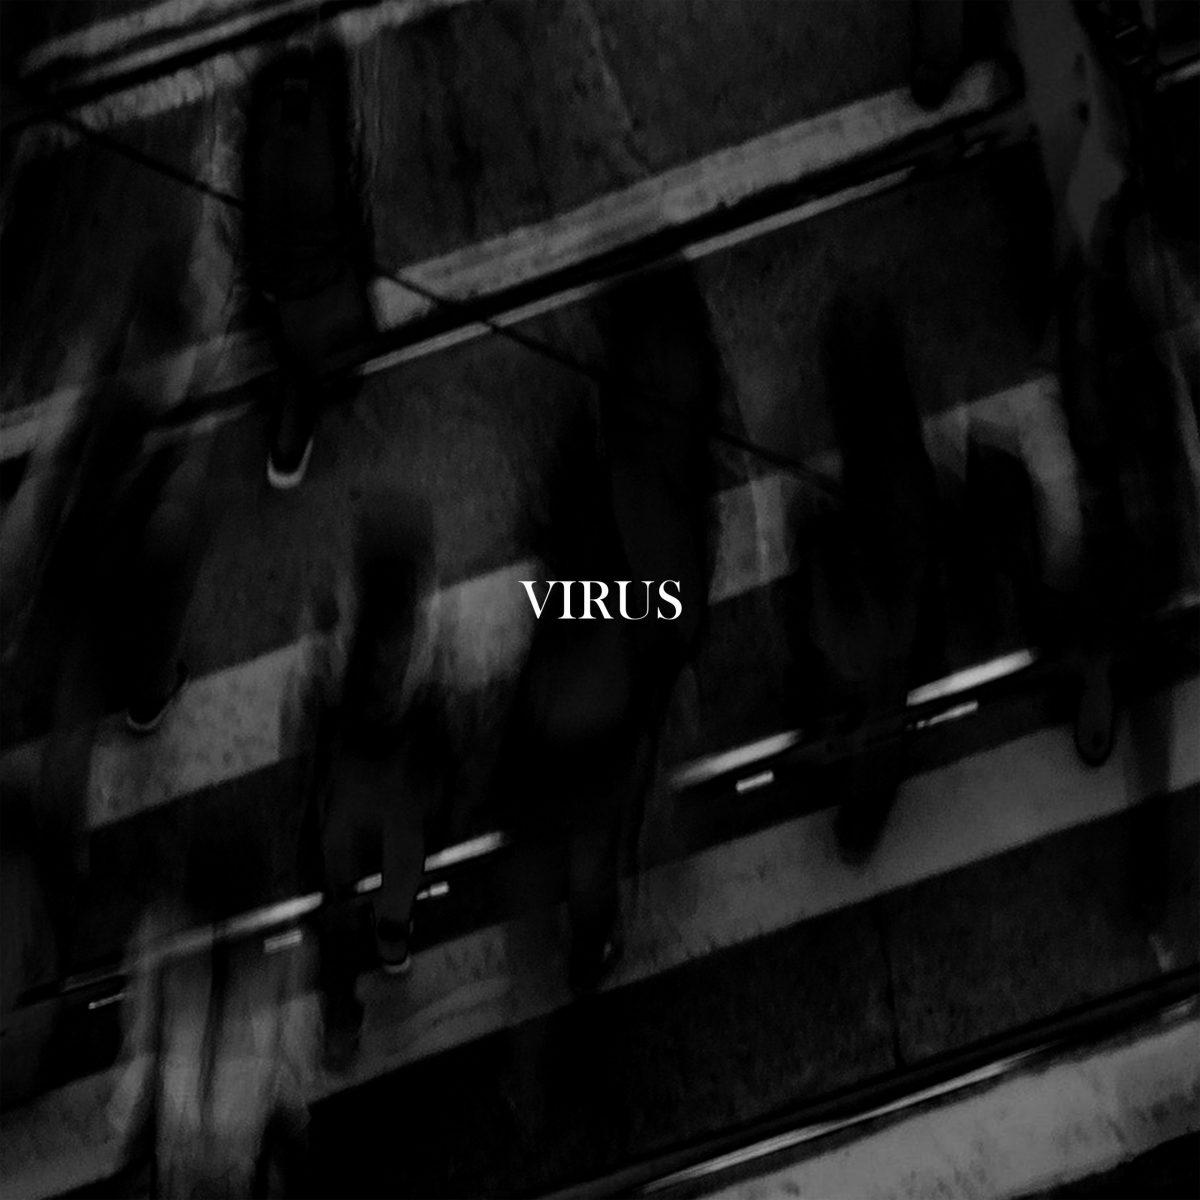 versus-goliath-virus-video-premiere-single-review